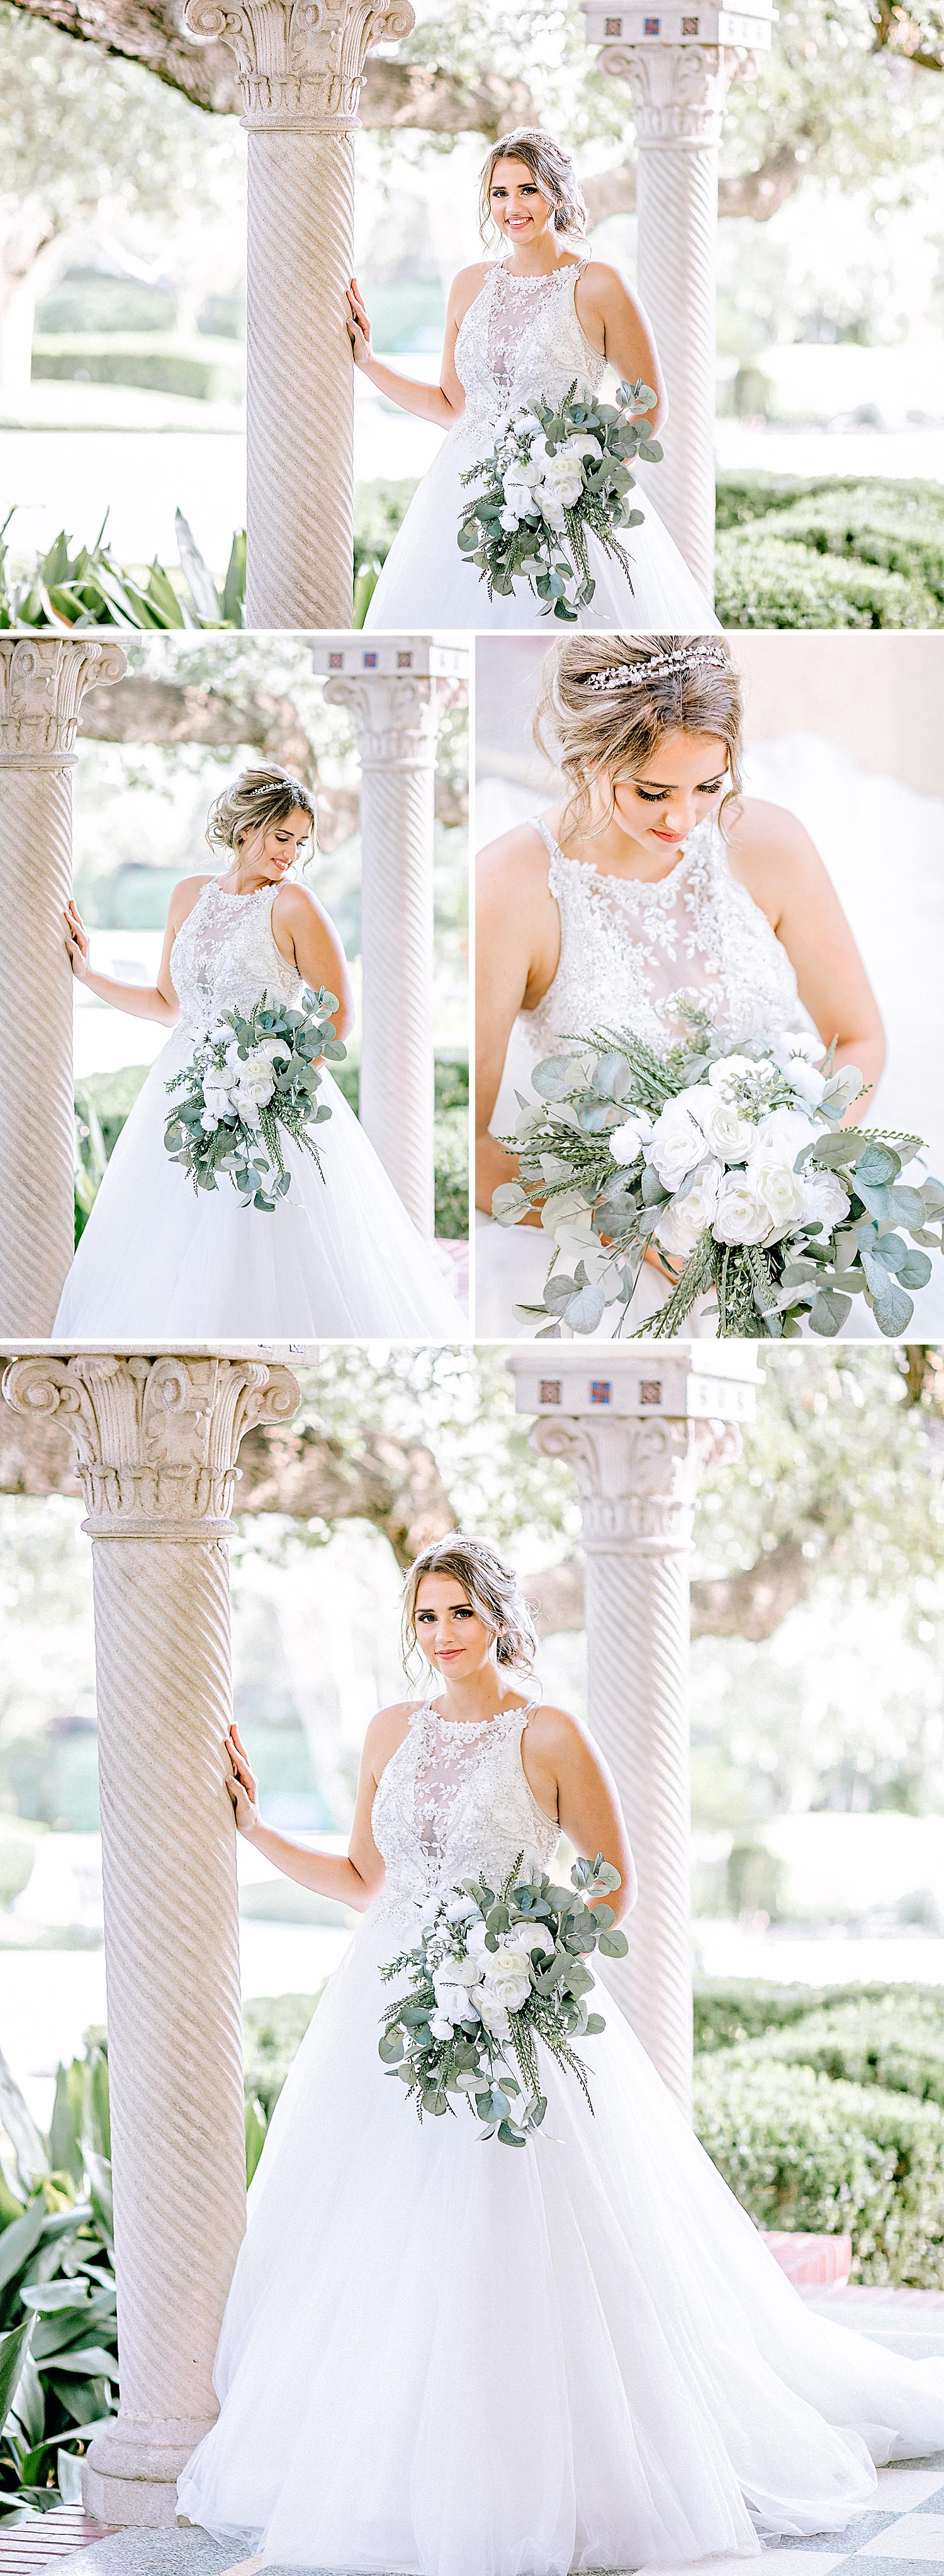 San-Antonio-Weddings-Bridal-Photos-Carly-Barton-Photography_0011.jpg